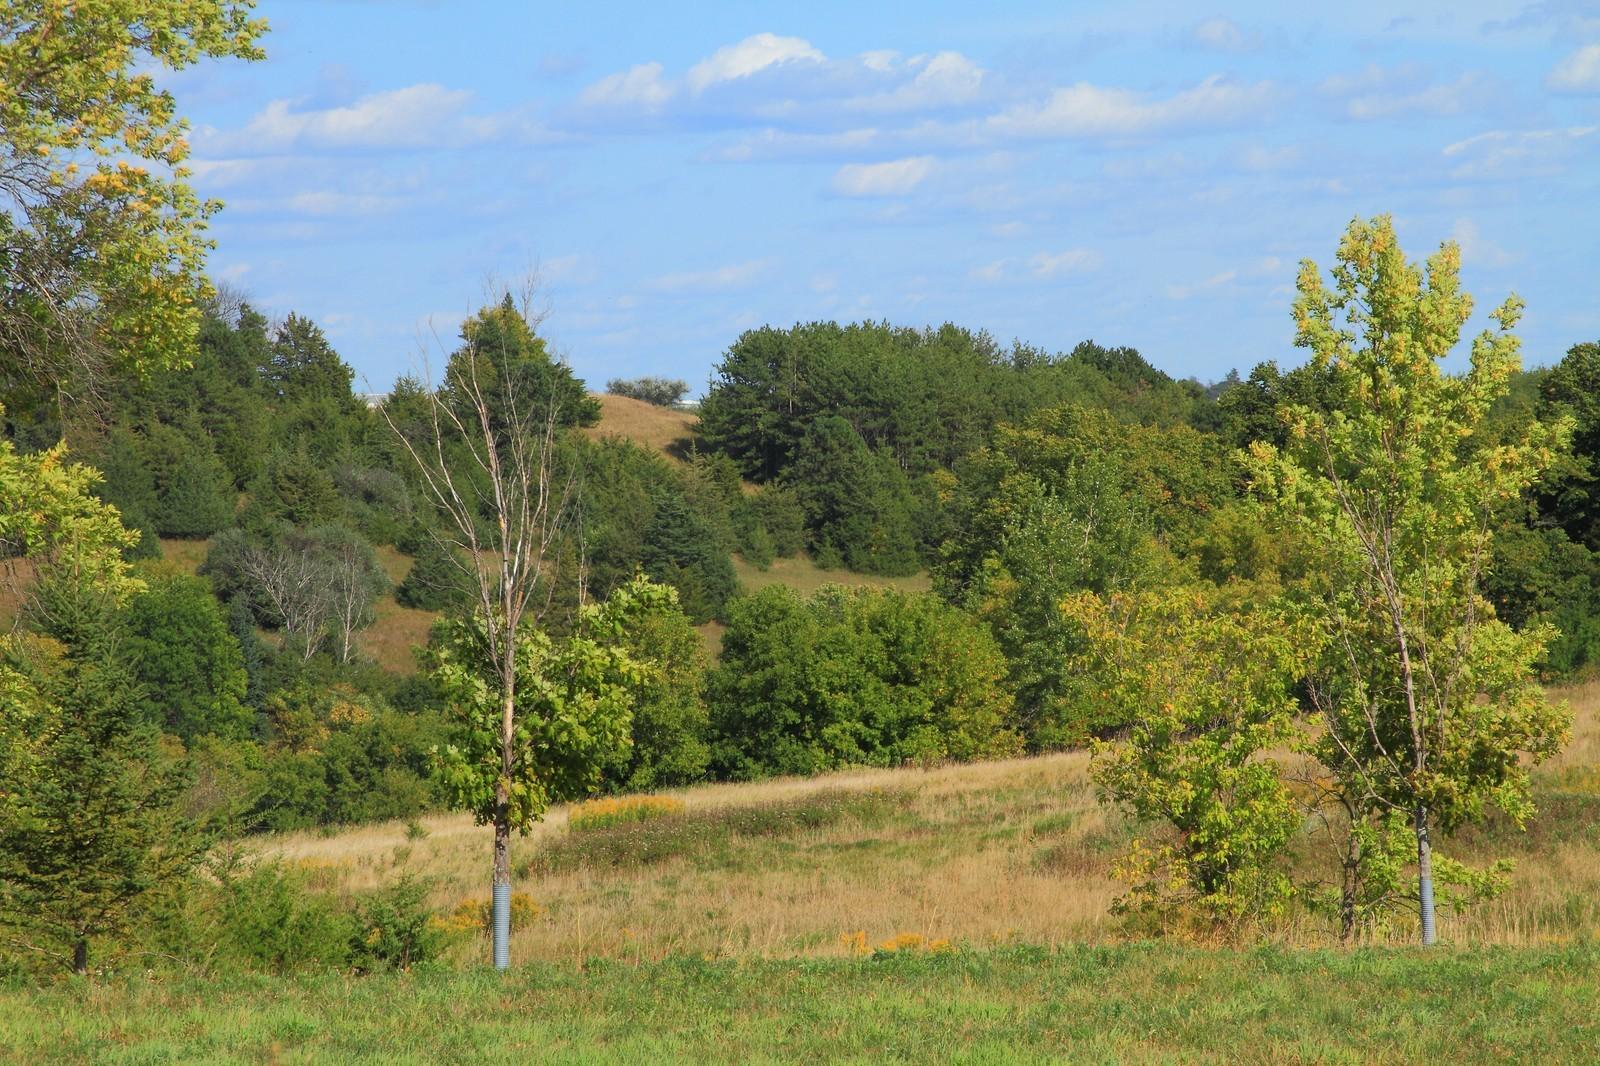 Real Estate Photography - 9627 Sky Lane, Eden Prairie, MN, 55347 - Location 5